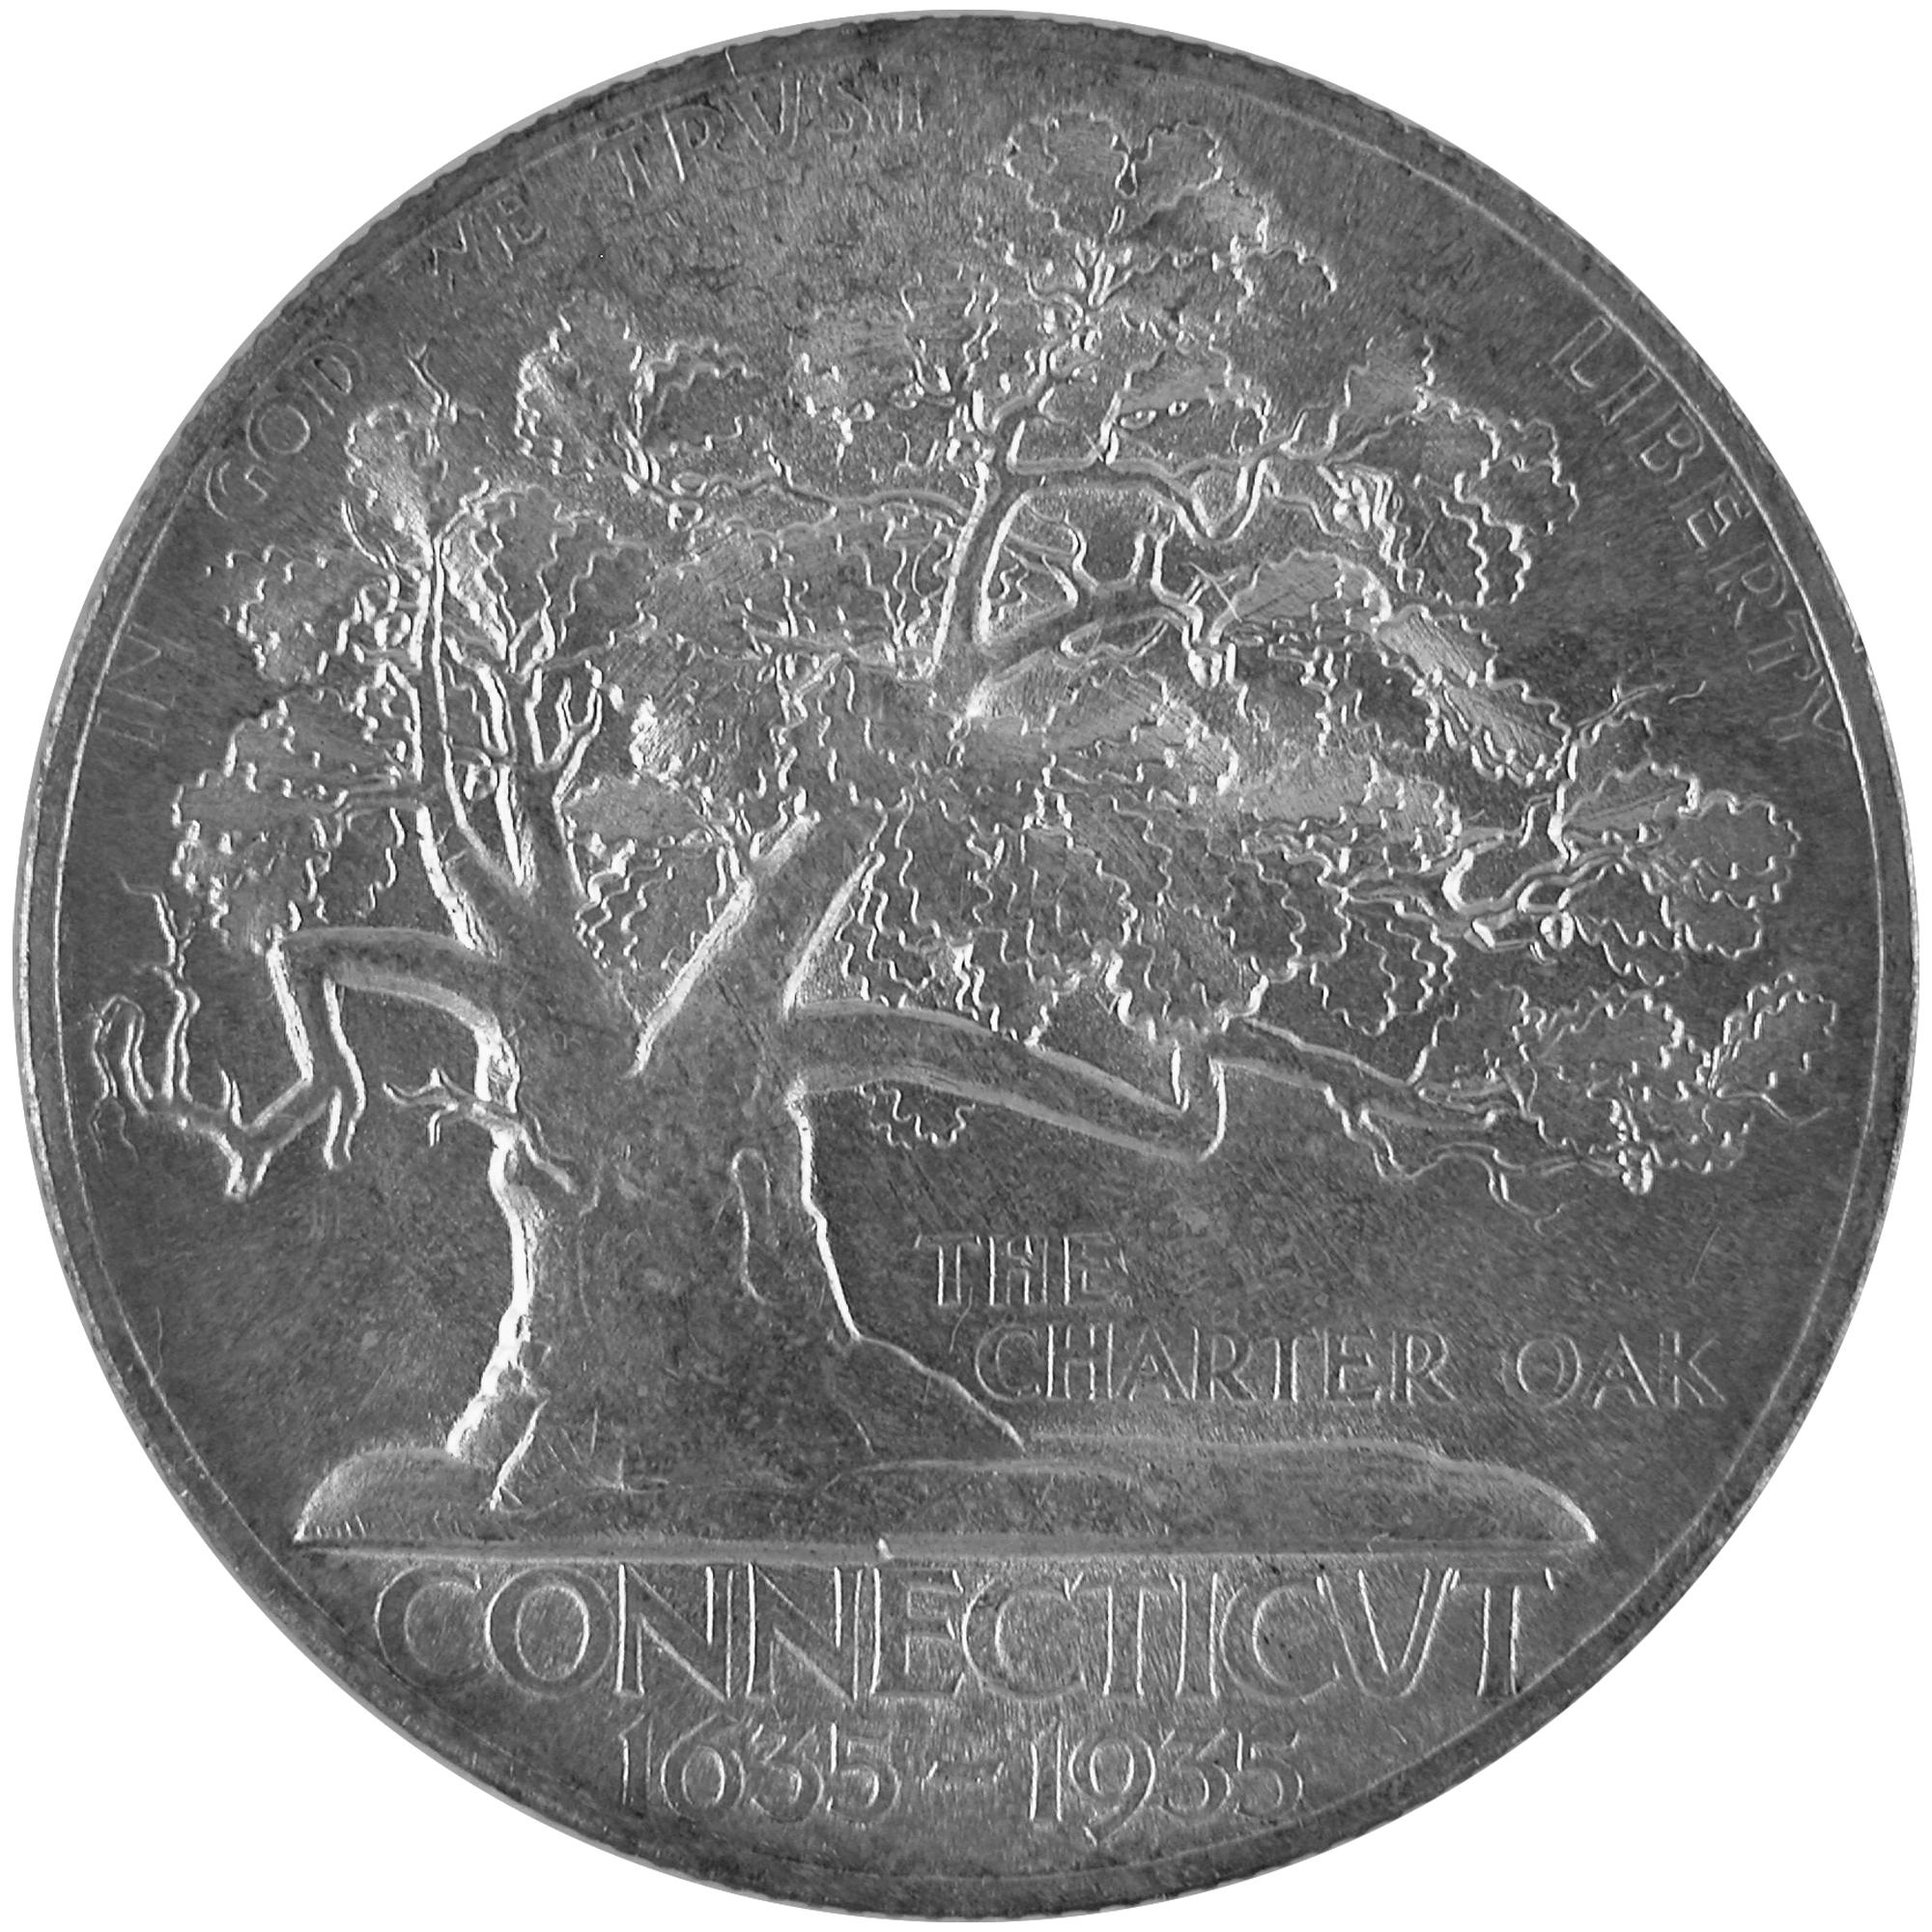 1935 Connecticut Tercentenary Commemorative Silver Half Dollar Coin Reverse